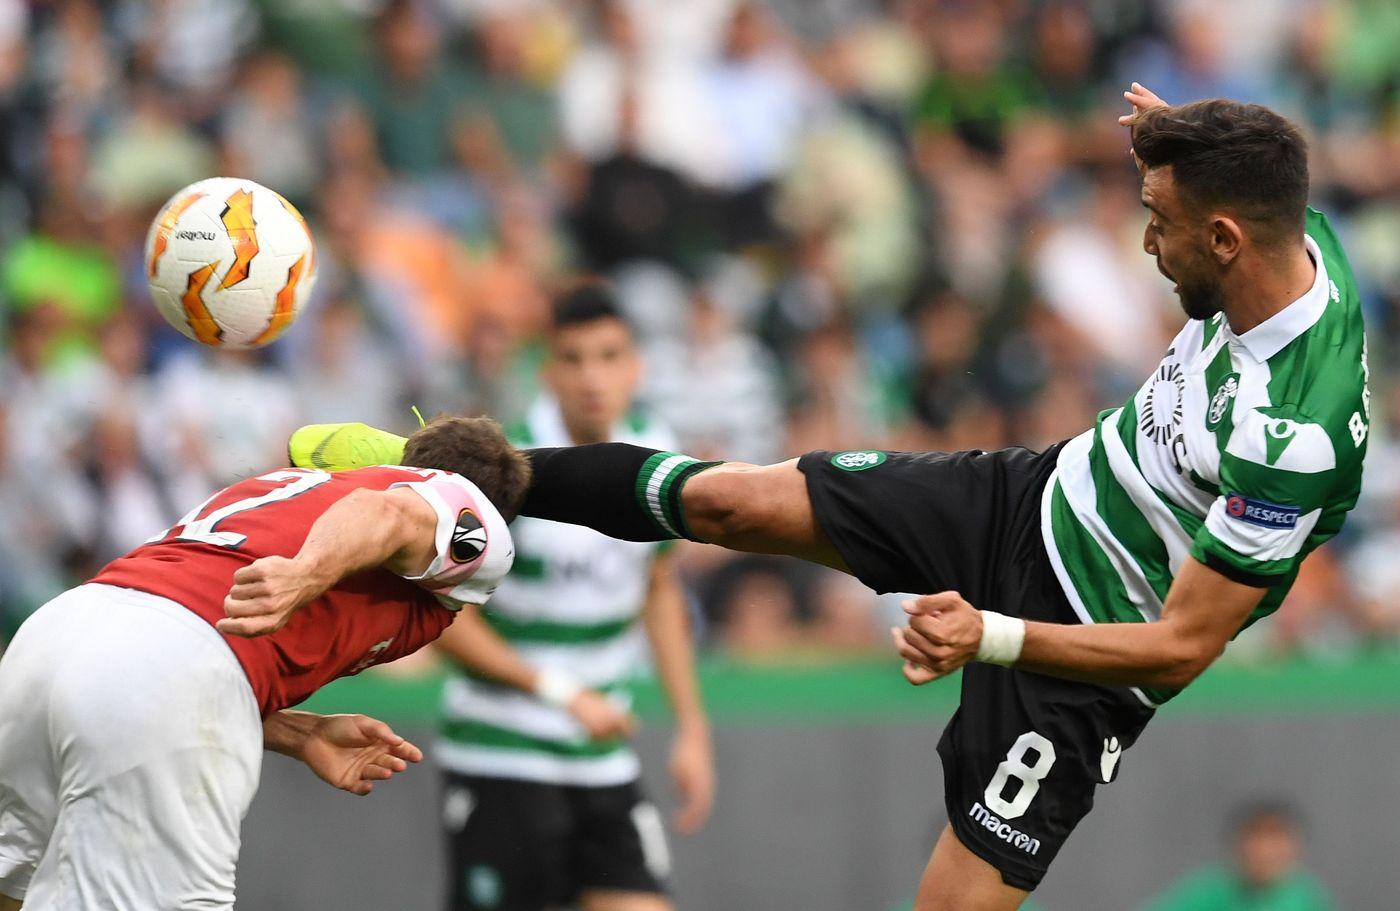 Sporting Feirense: Feirense-Sporting Lisbona Mercoledì 16 Gennaio: La Quota